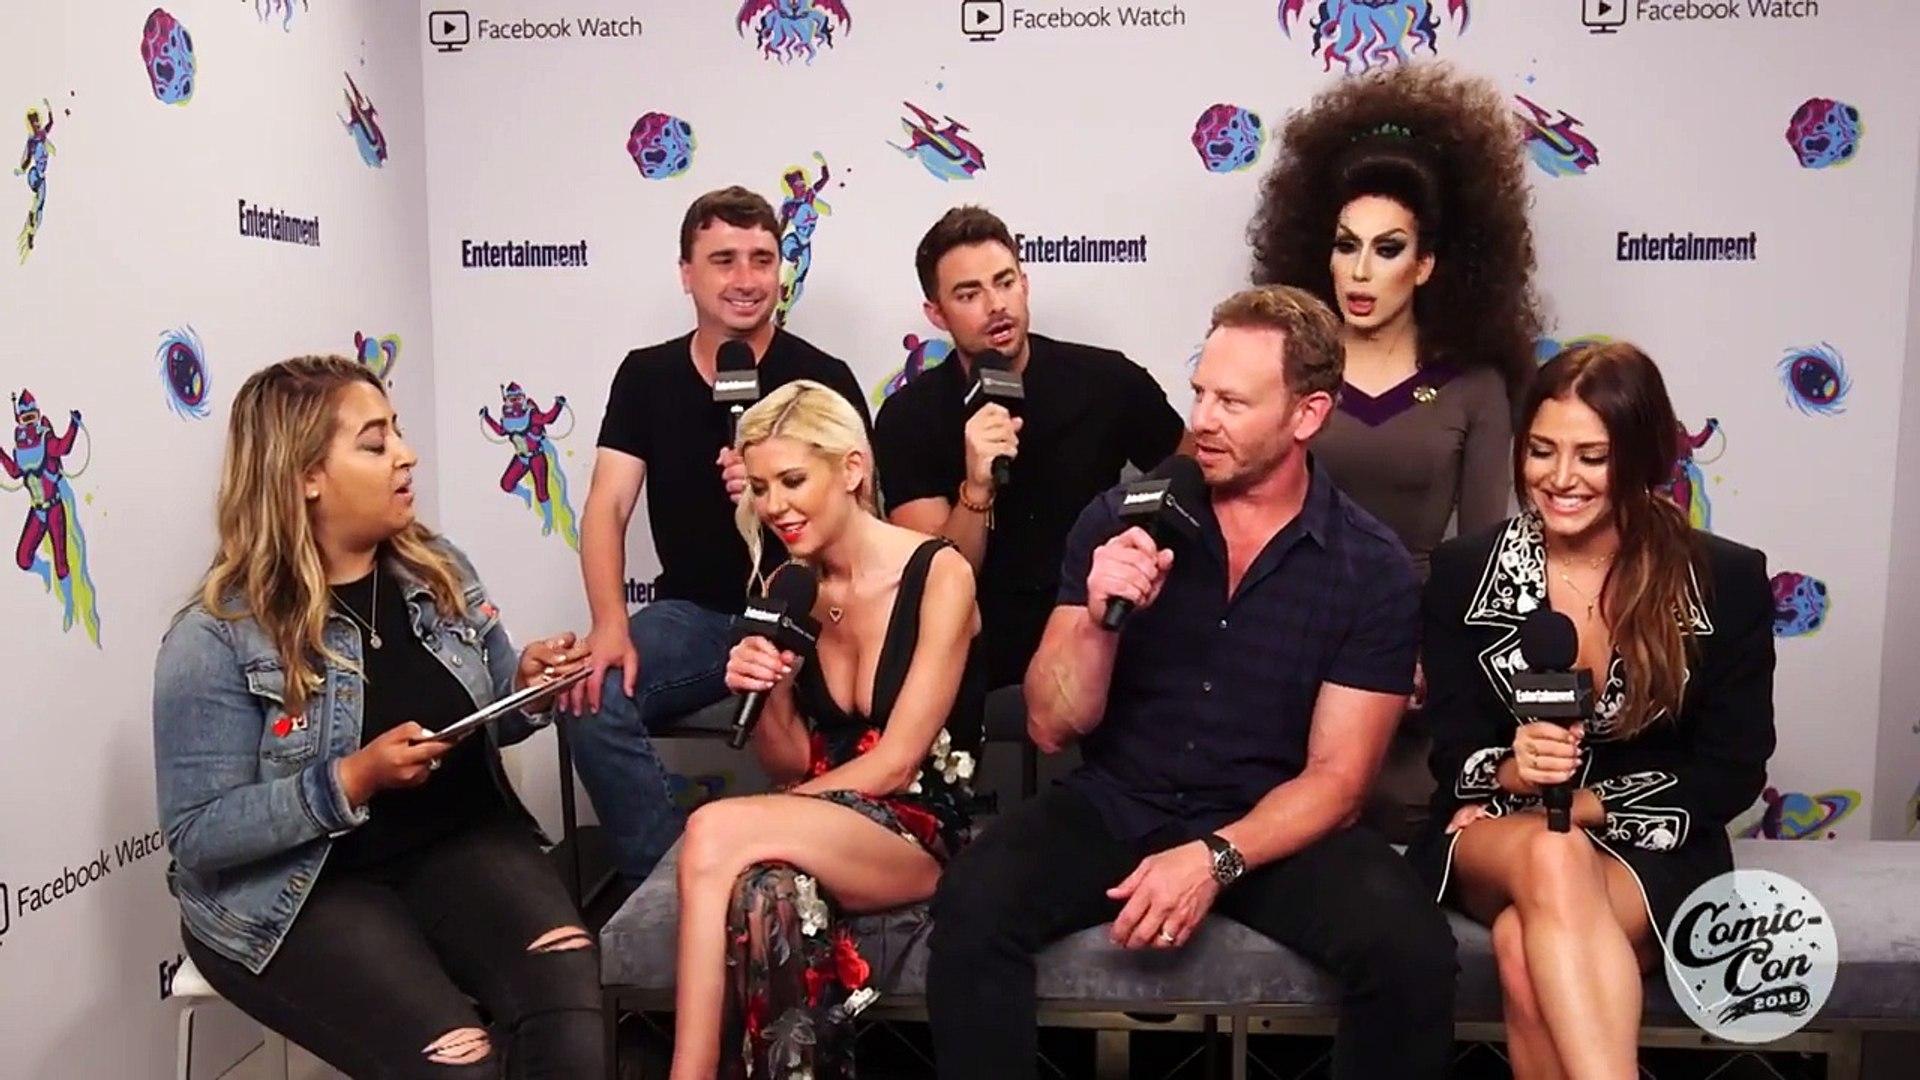 'Sharknado 6' Cast Talks About Their Explosive Final Installment | SDCC 2018 | Entertainme